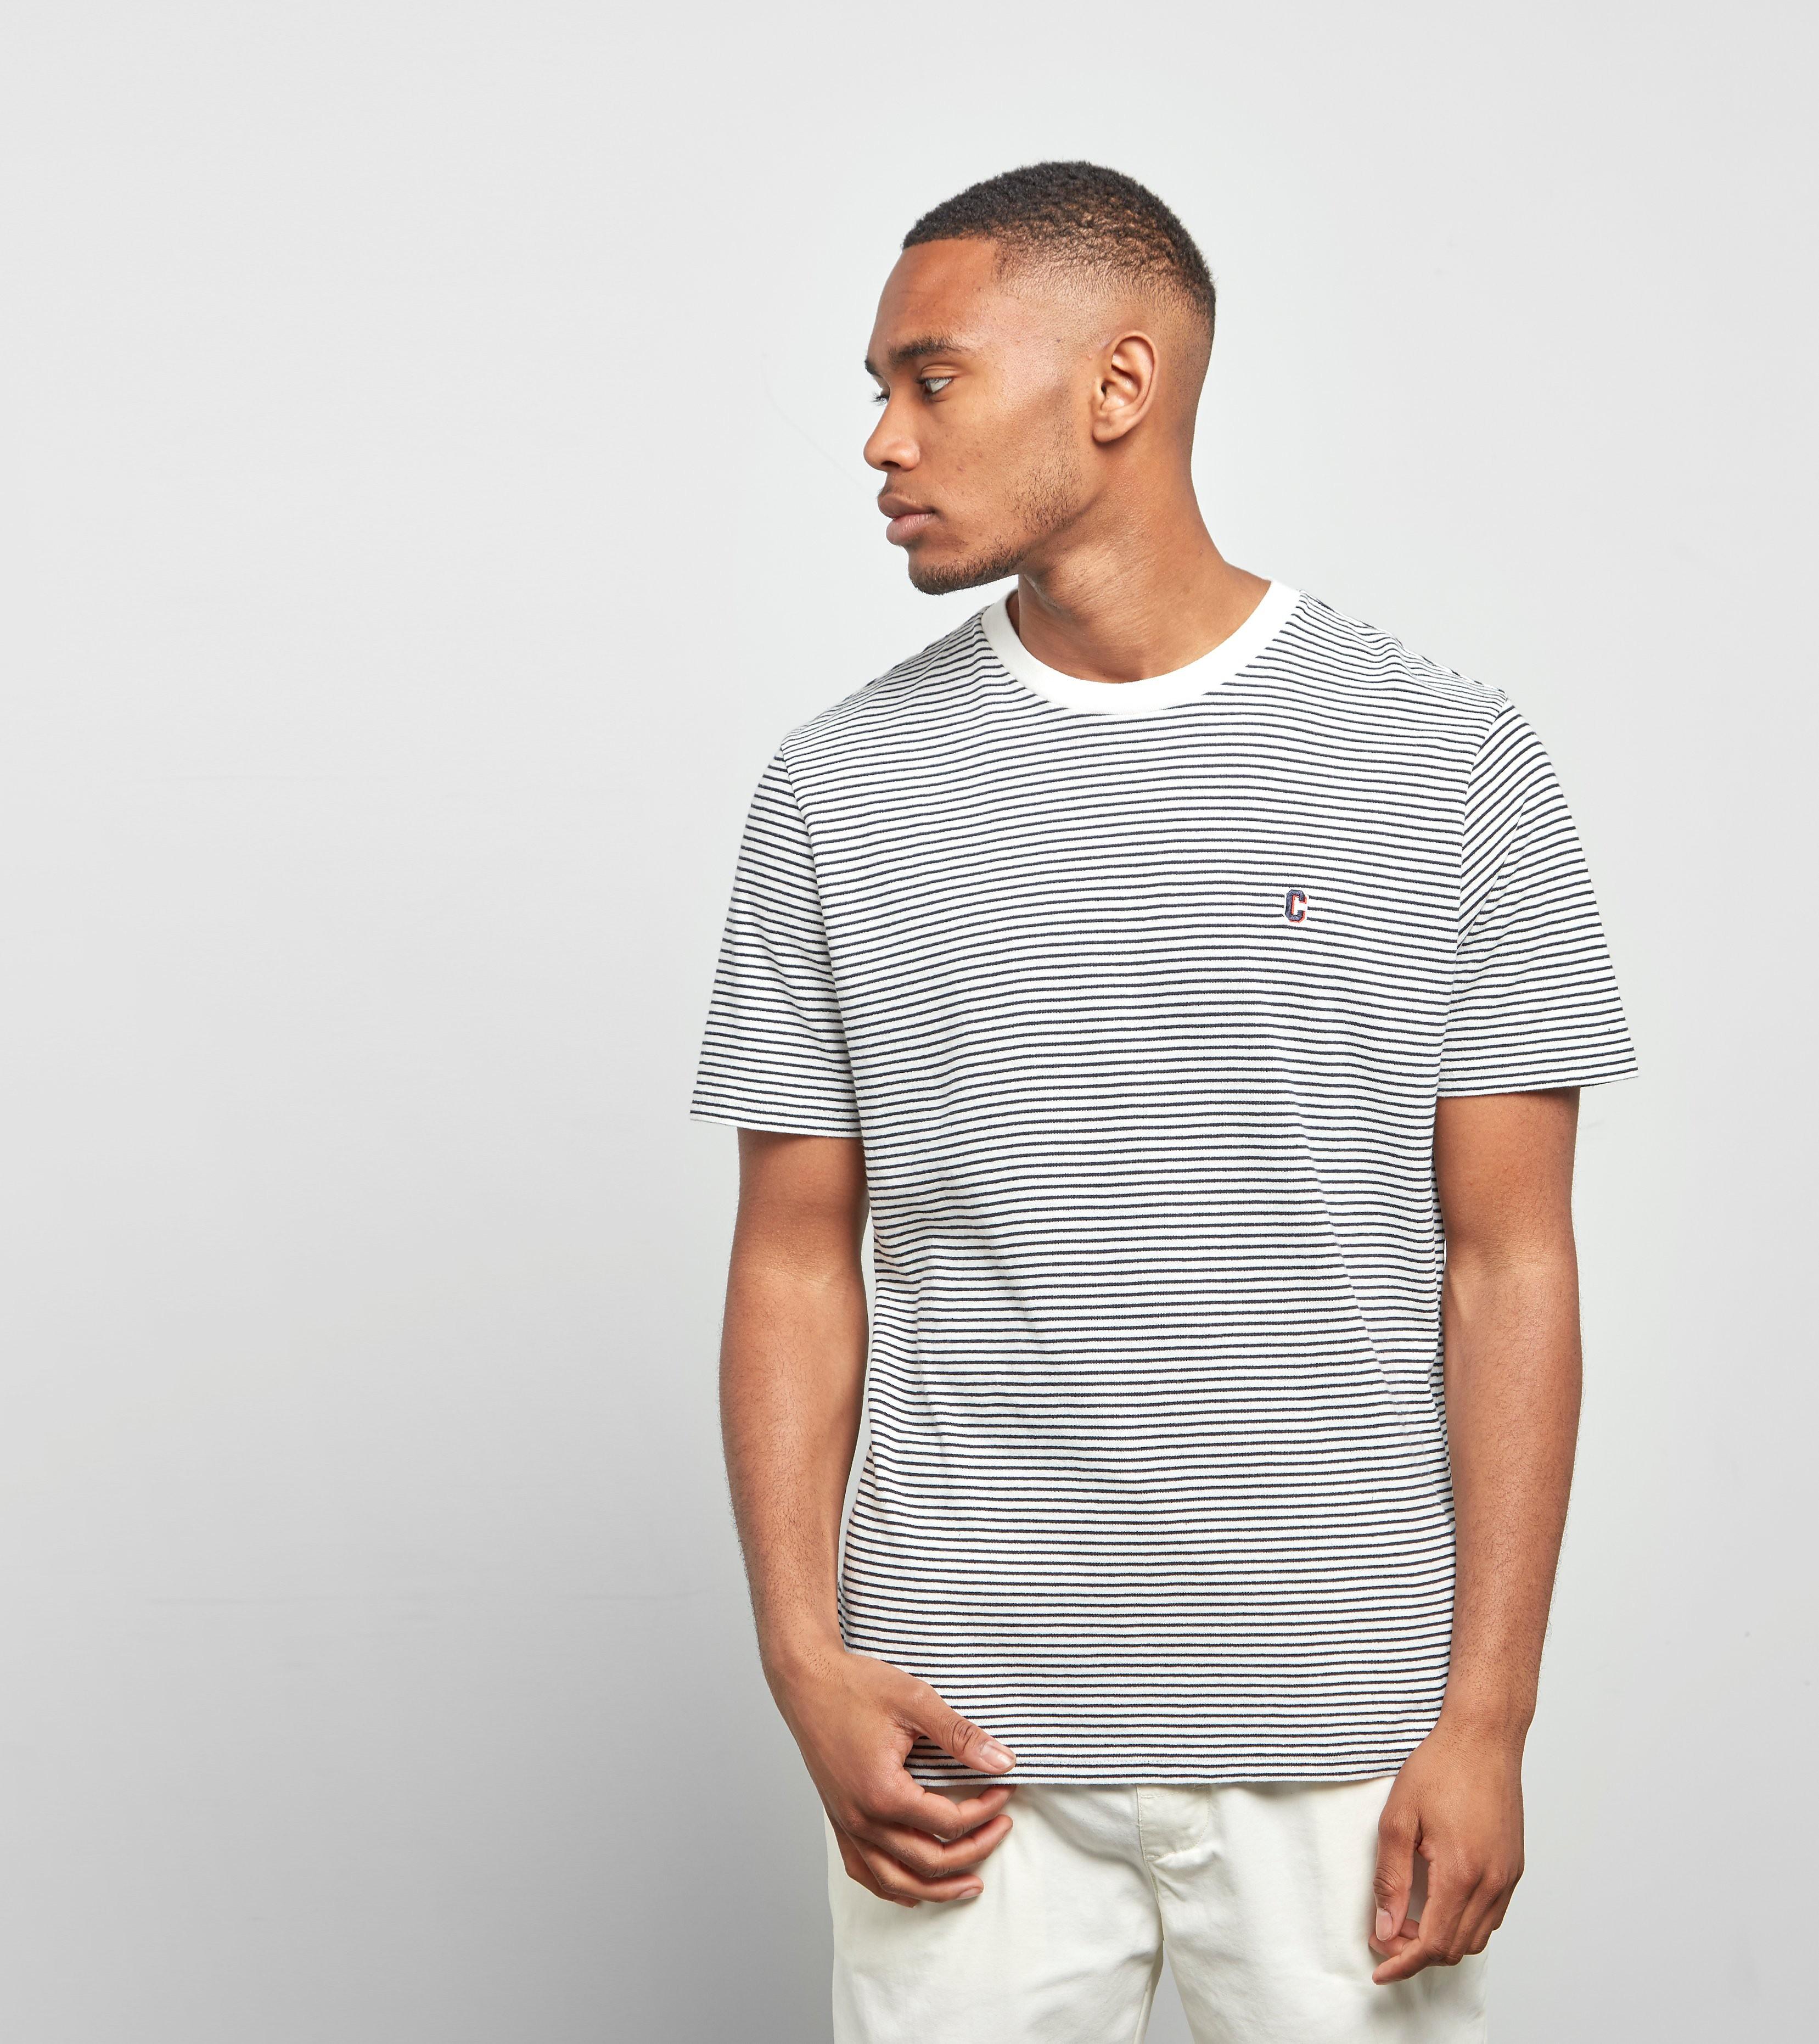 Carhartt WIP Bounty Prior T-shirt